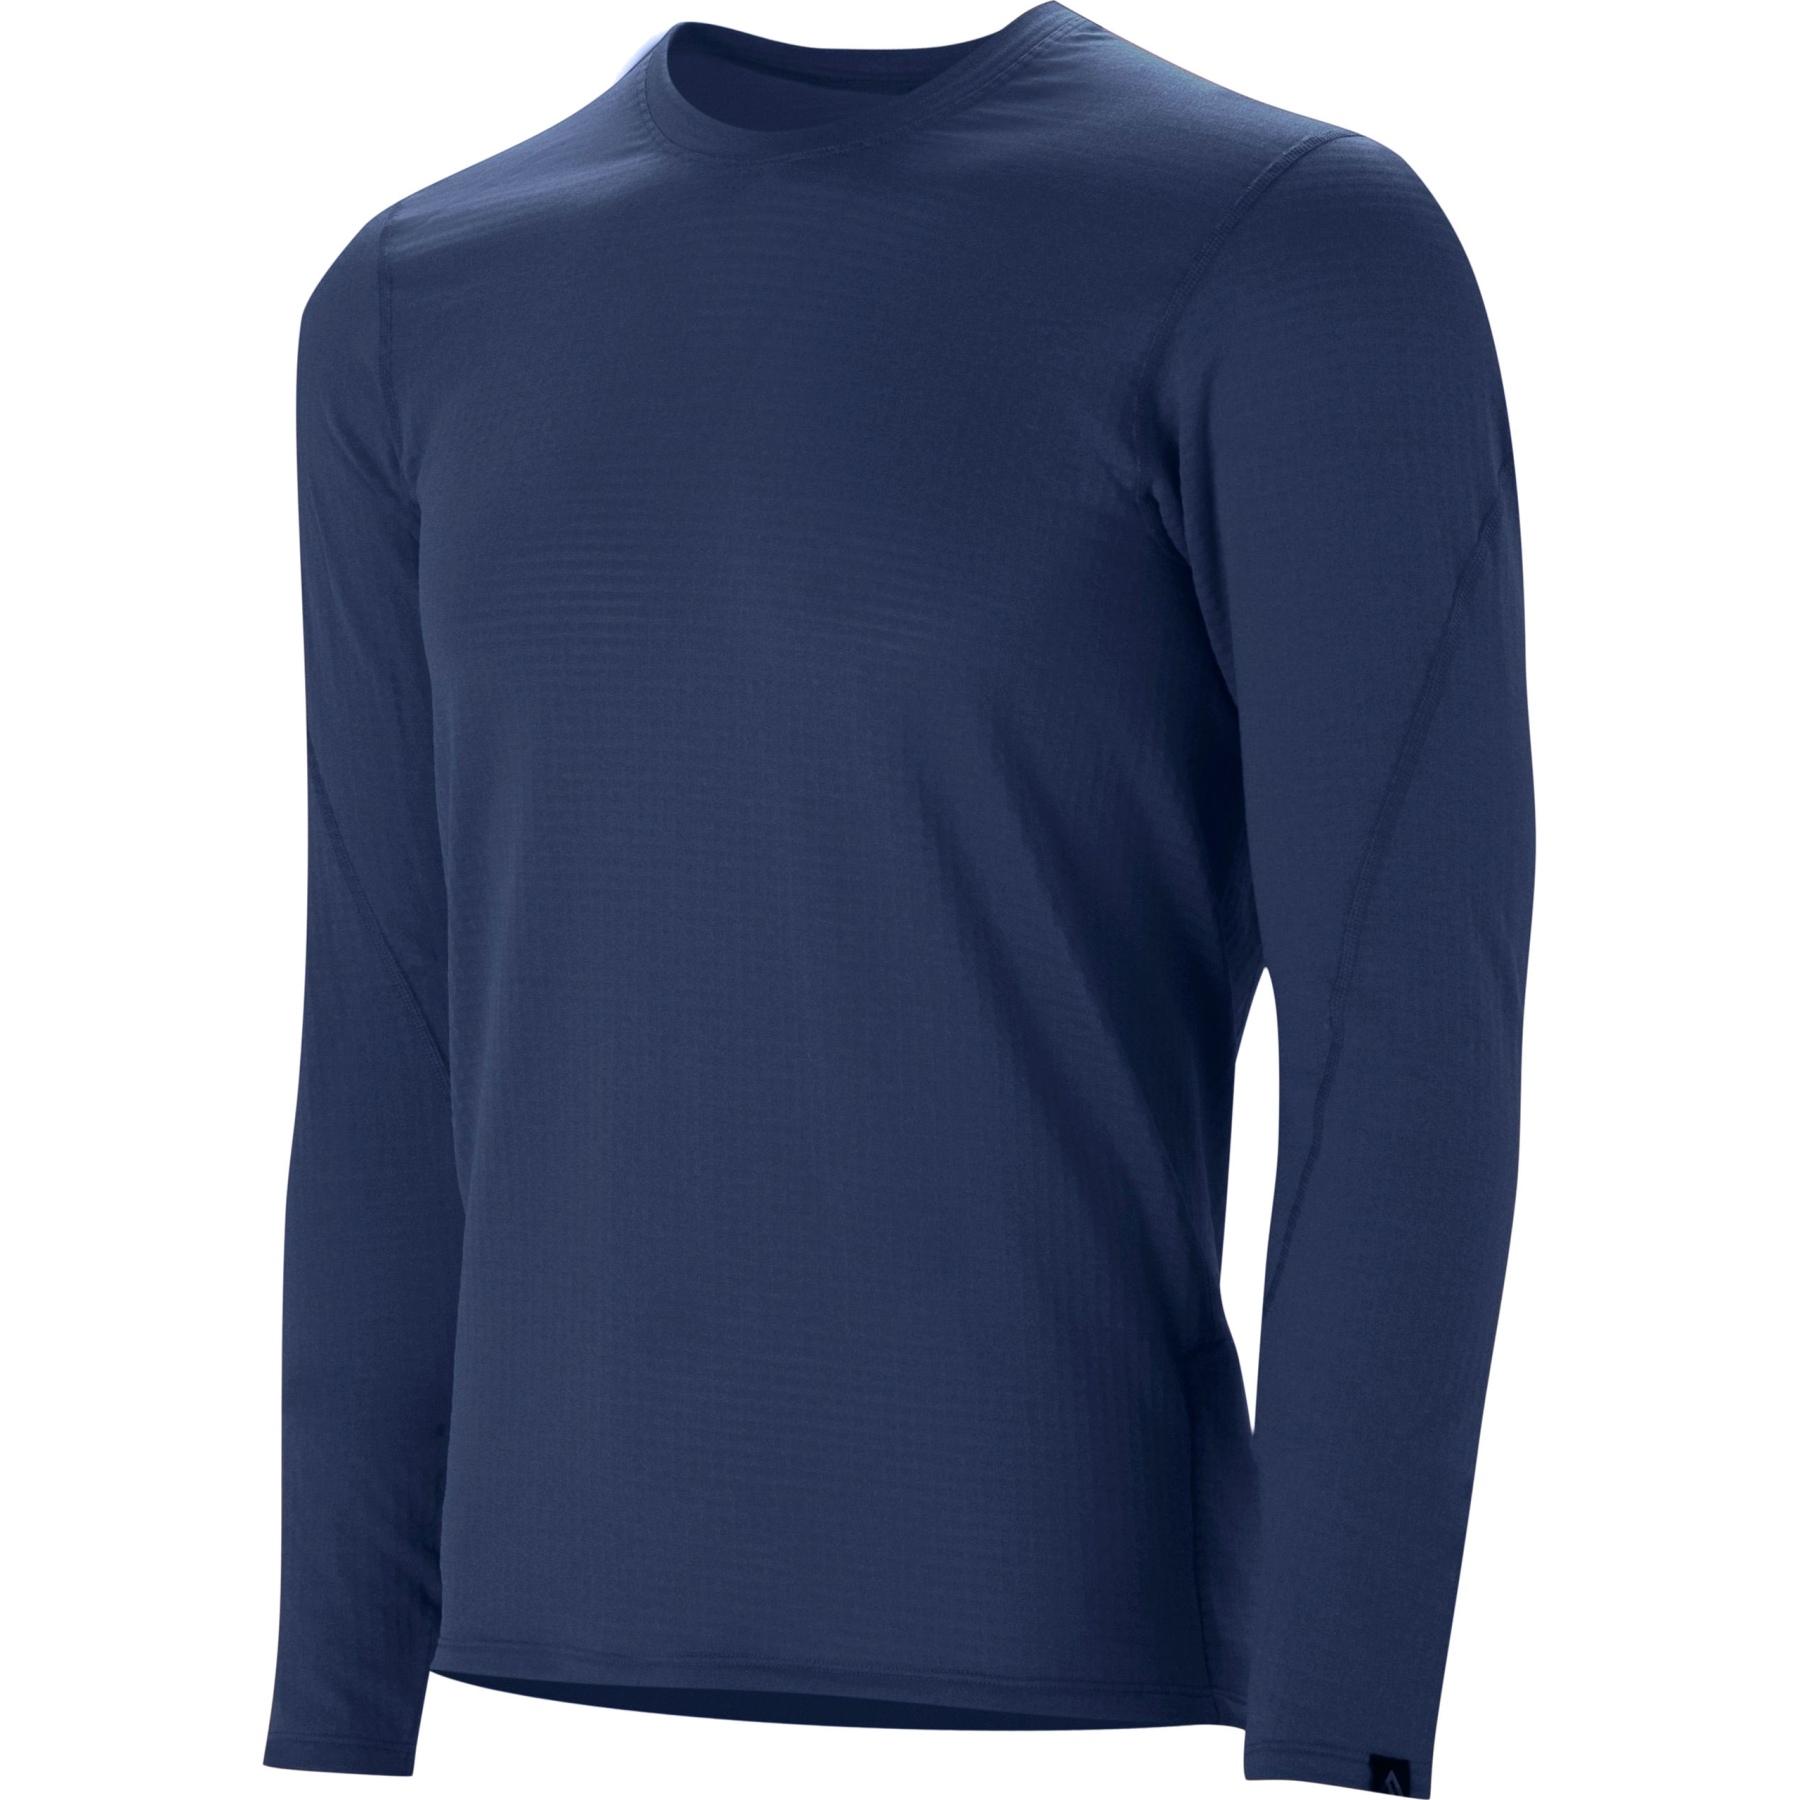 Imagen de 7mesh Gryphon Camiseta de Mangas Largas para Hombre - cadet azul